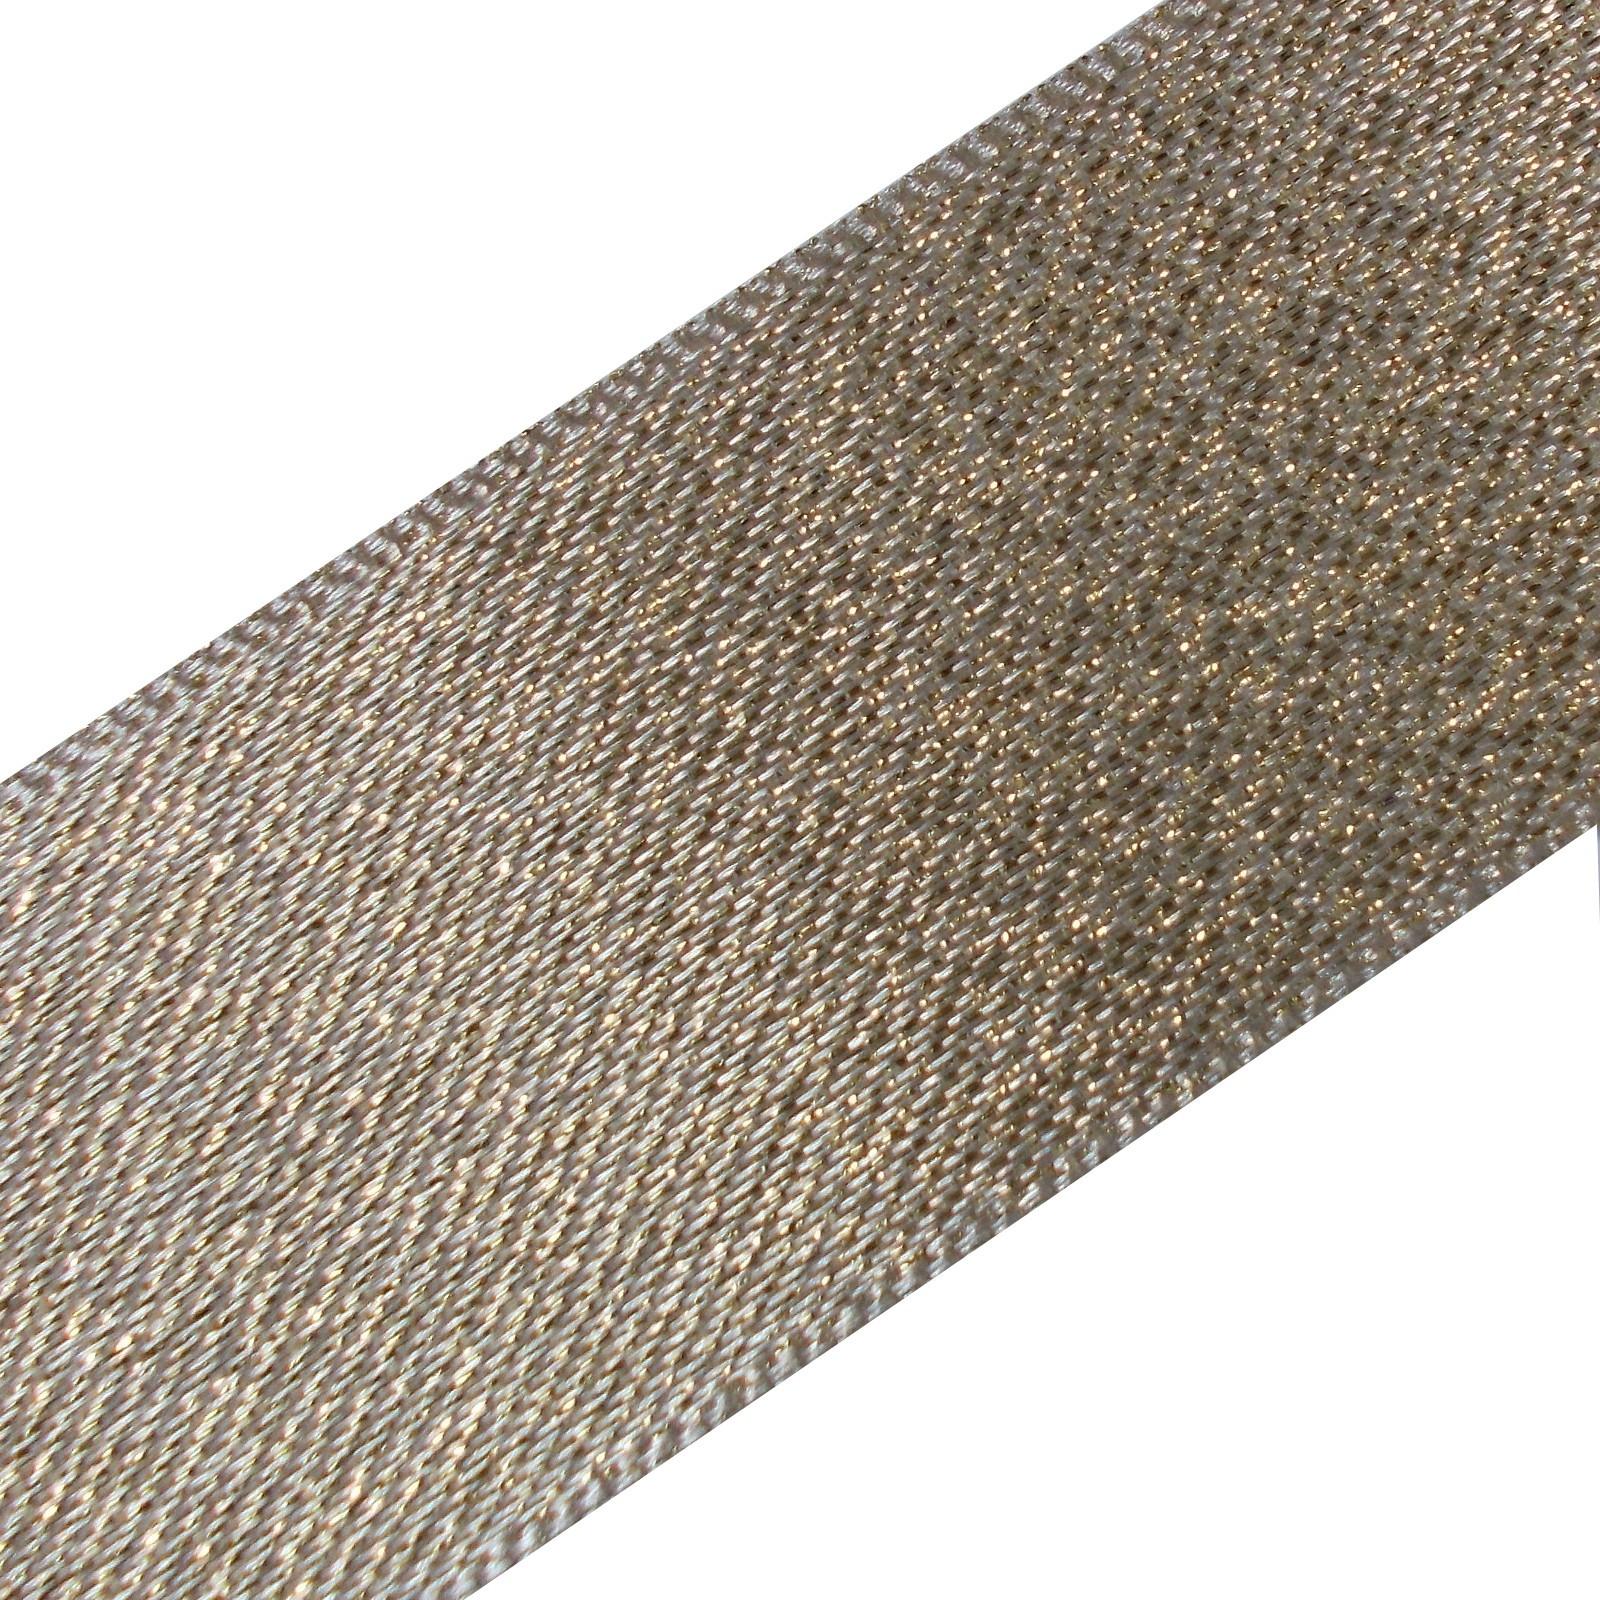 Berisfords Glitter Satin Ribbon 10mm wide Light Gold 1 metre length